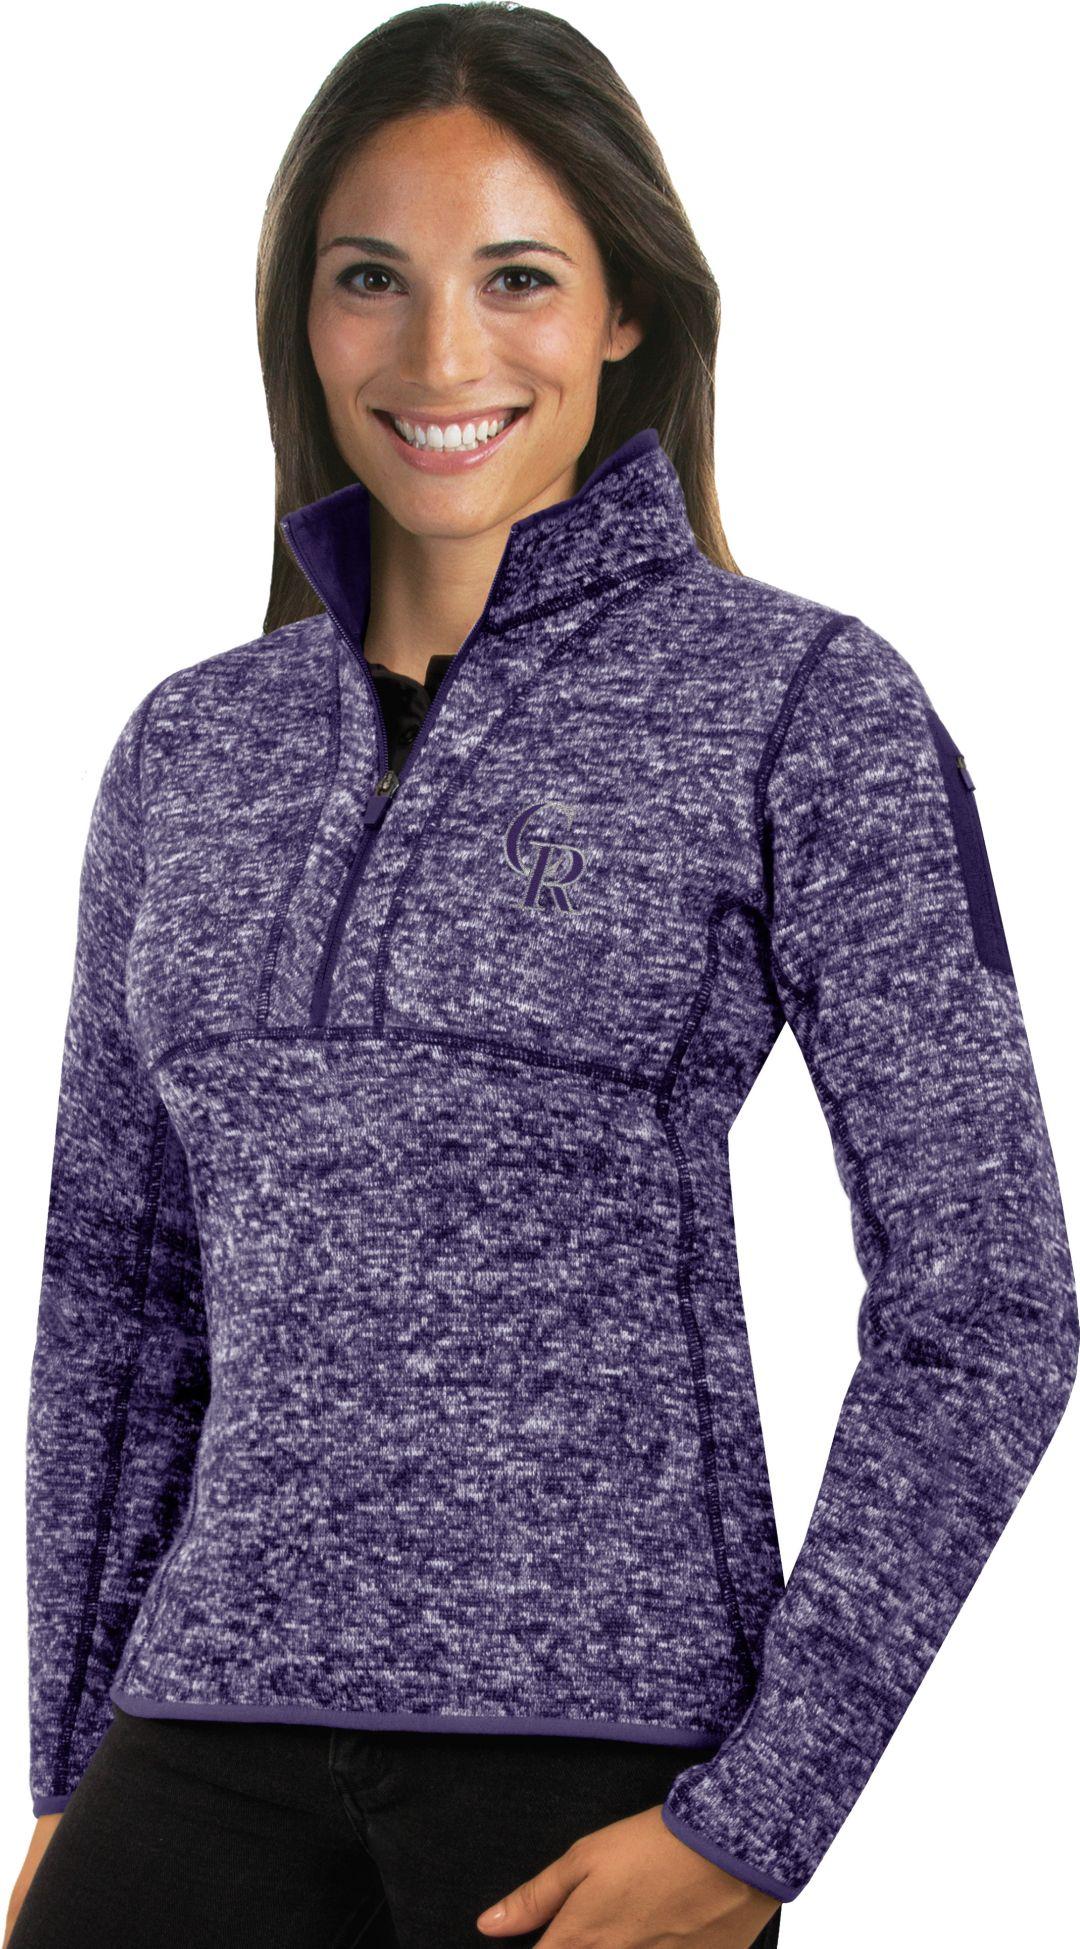 timeless design 944c8 76291 Antigua Women's Colorado Rockies Purple Fortune Half-Zip Pullover